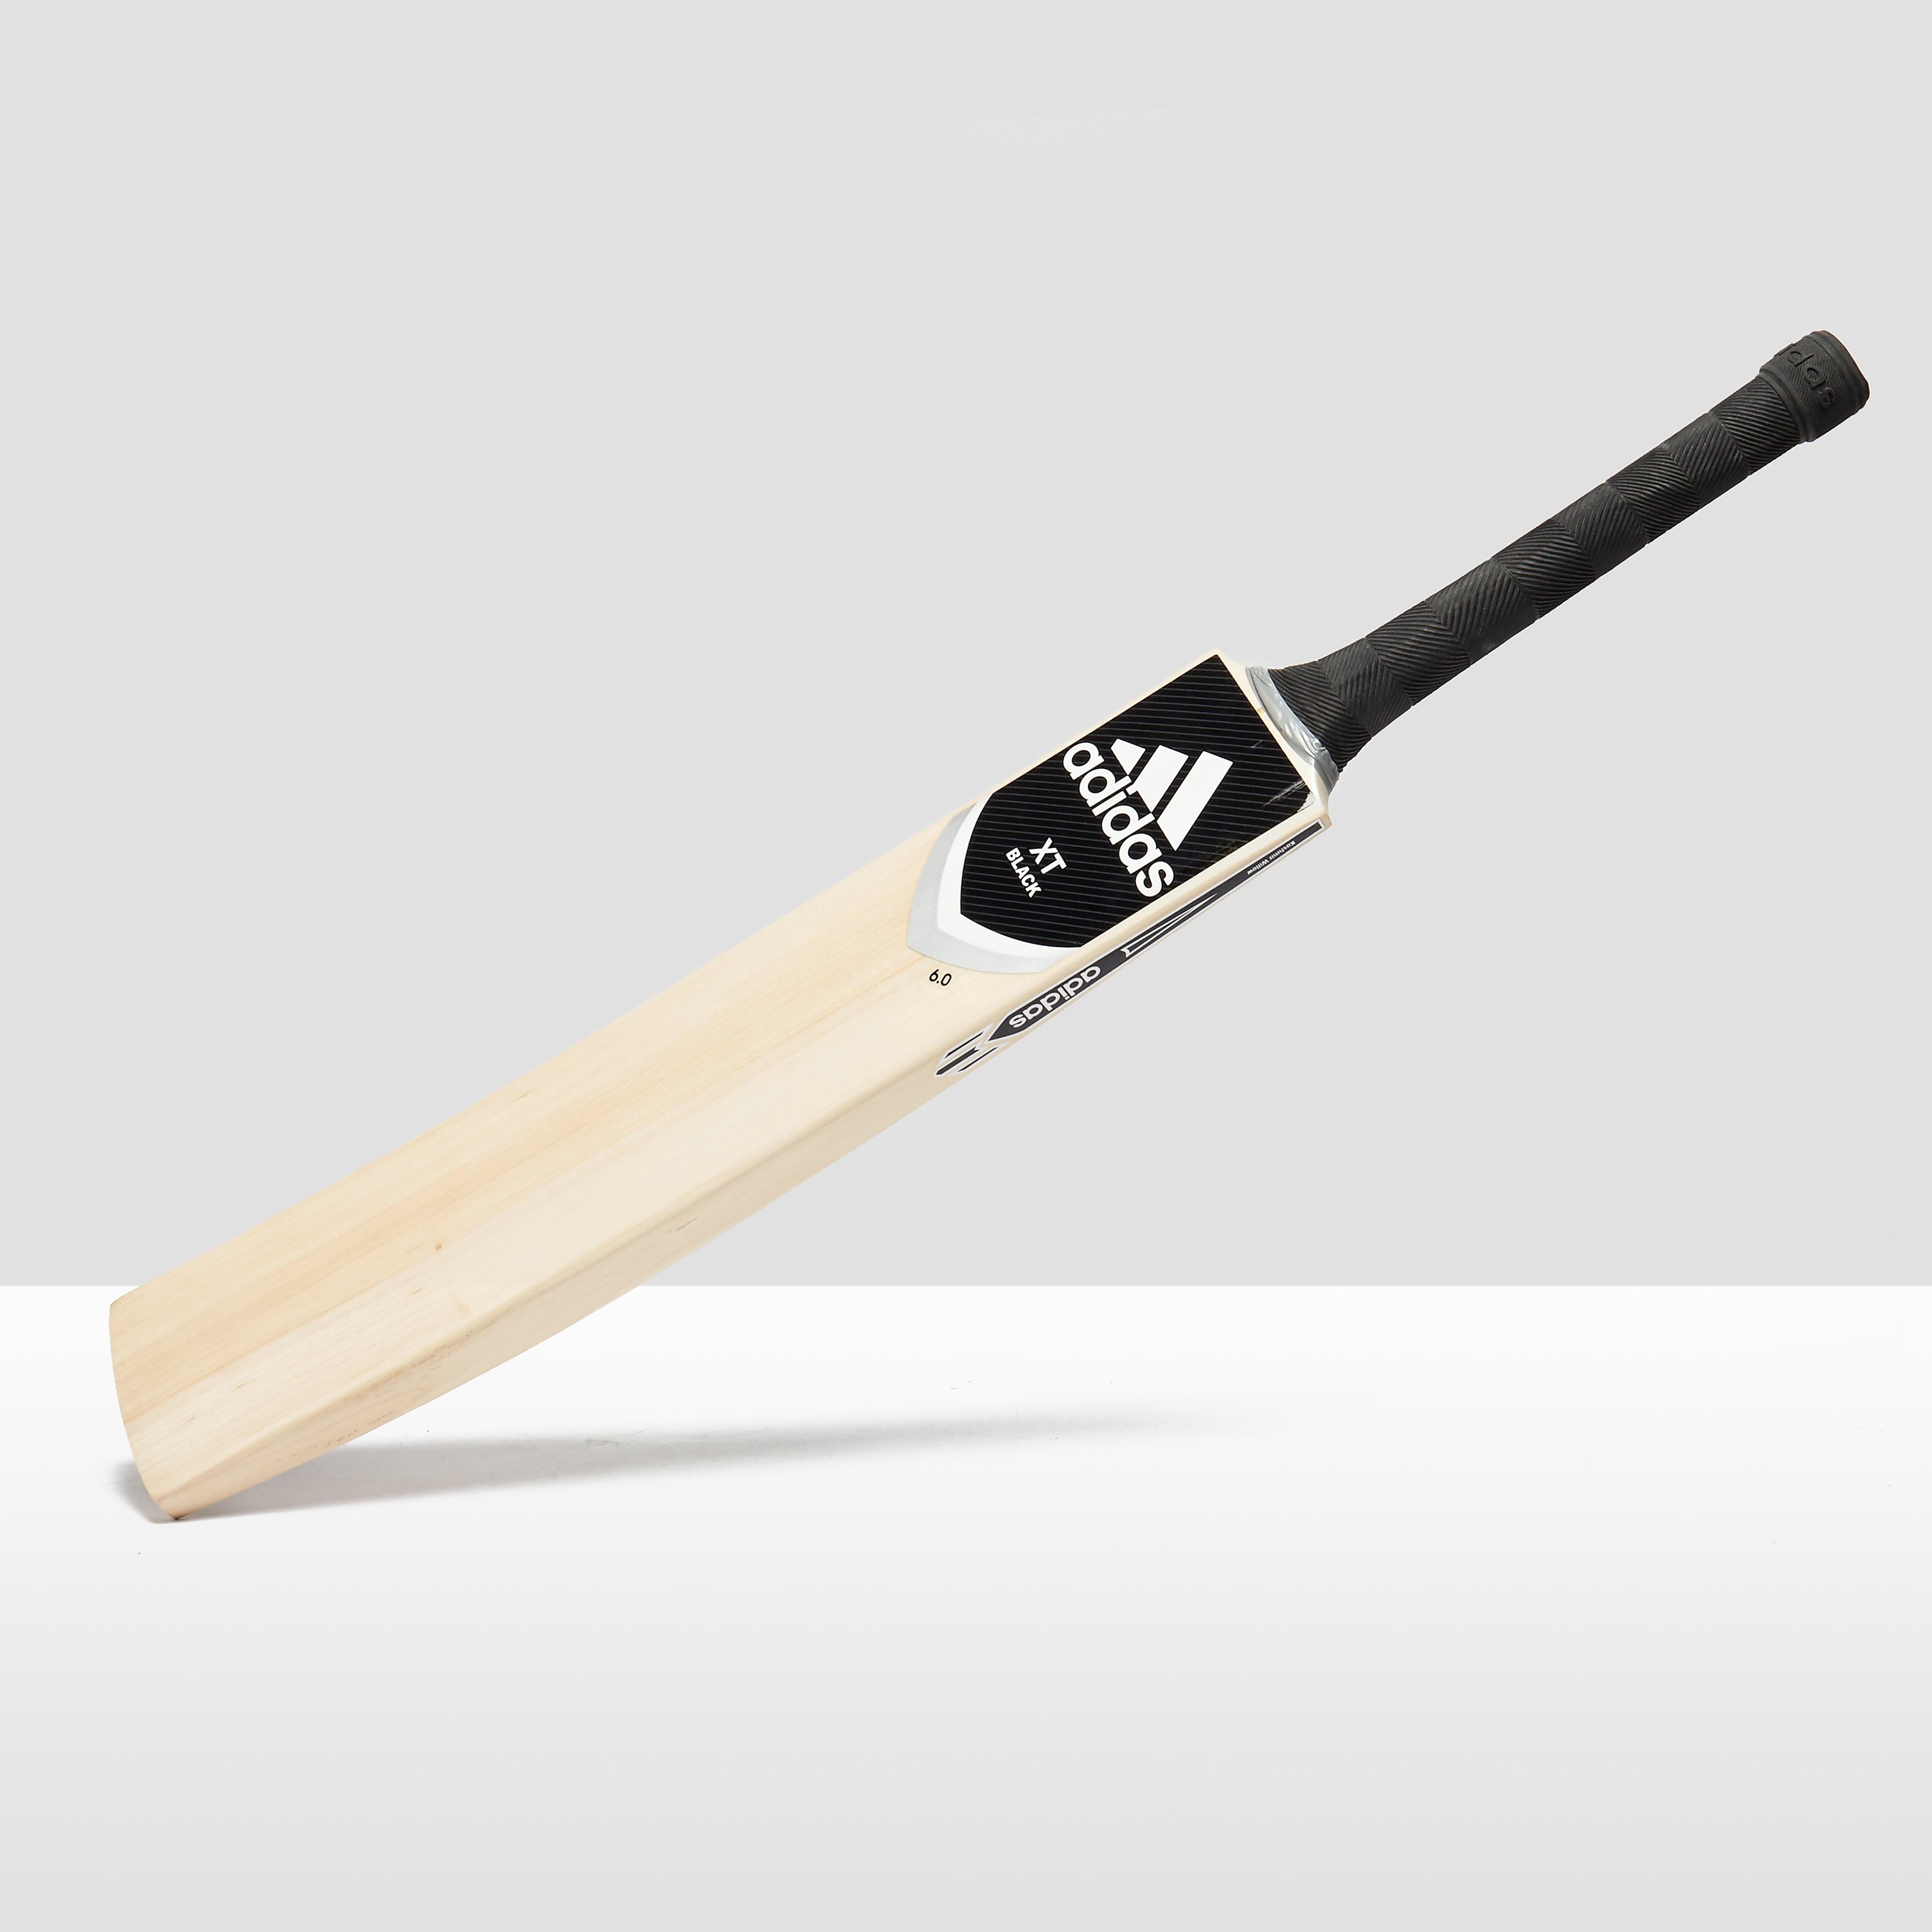 adidas XT Black 6.0 Junior Cricket Bat